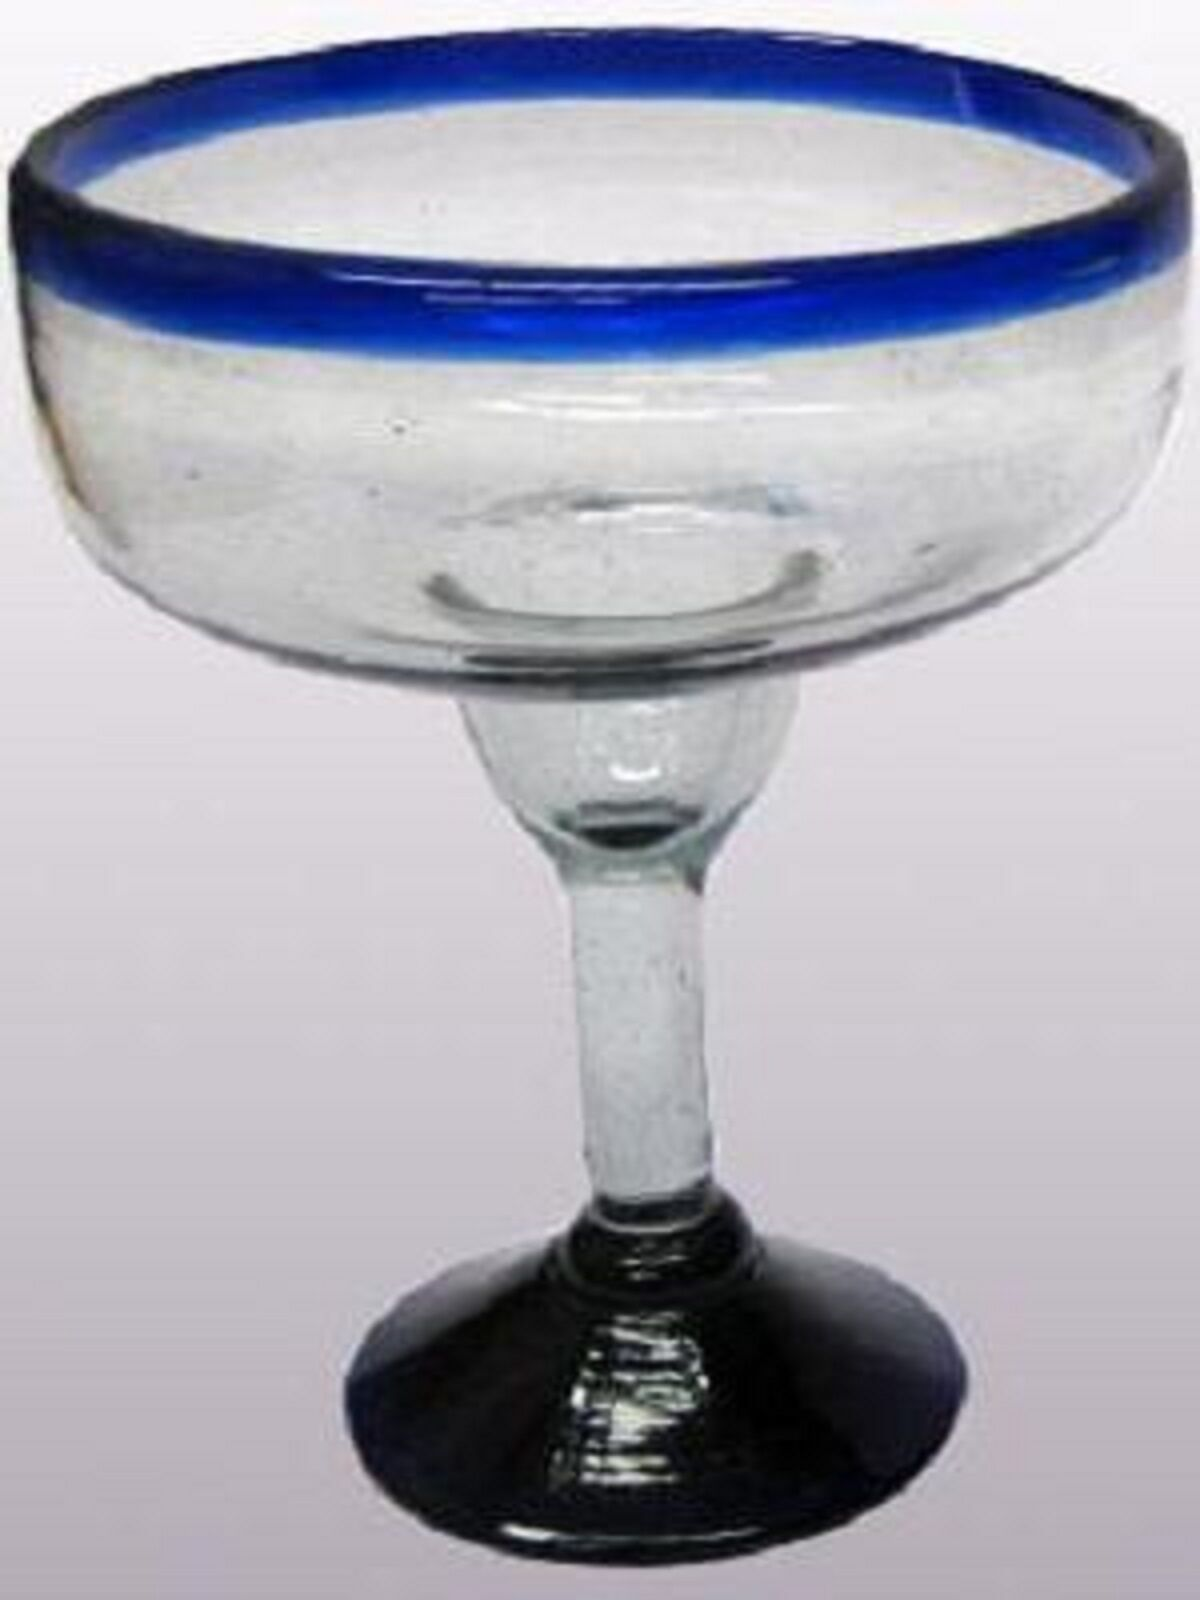 Mexican Glassware - Cobalt bluee Rim large margarita glasses (set of 6)